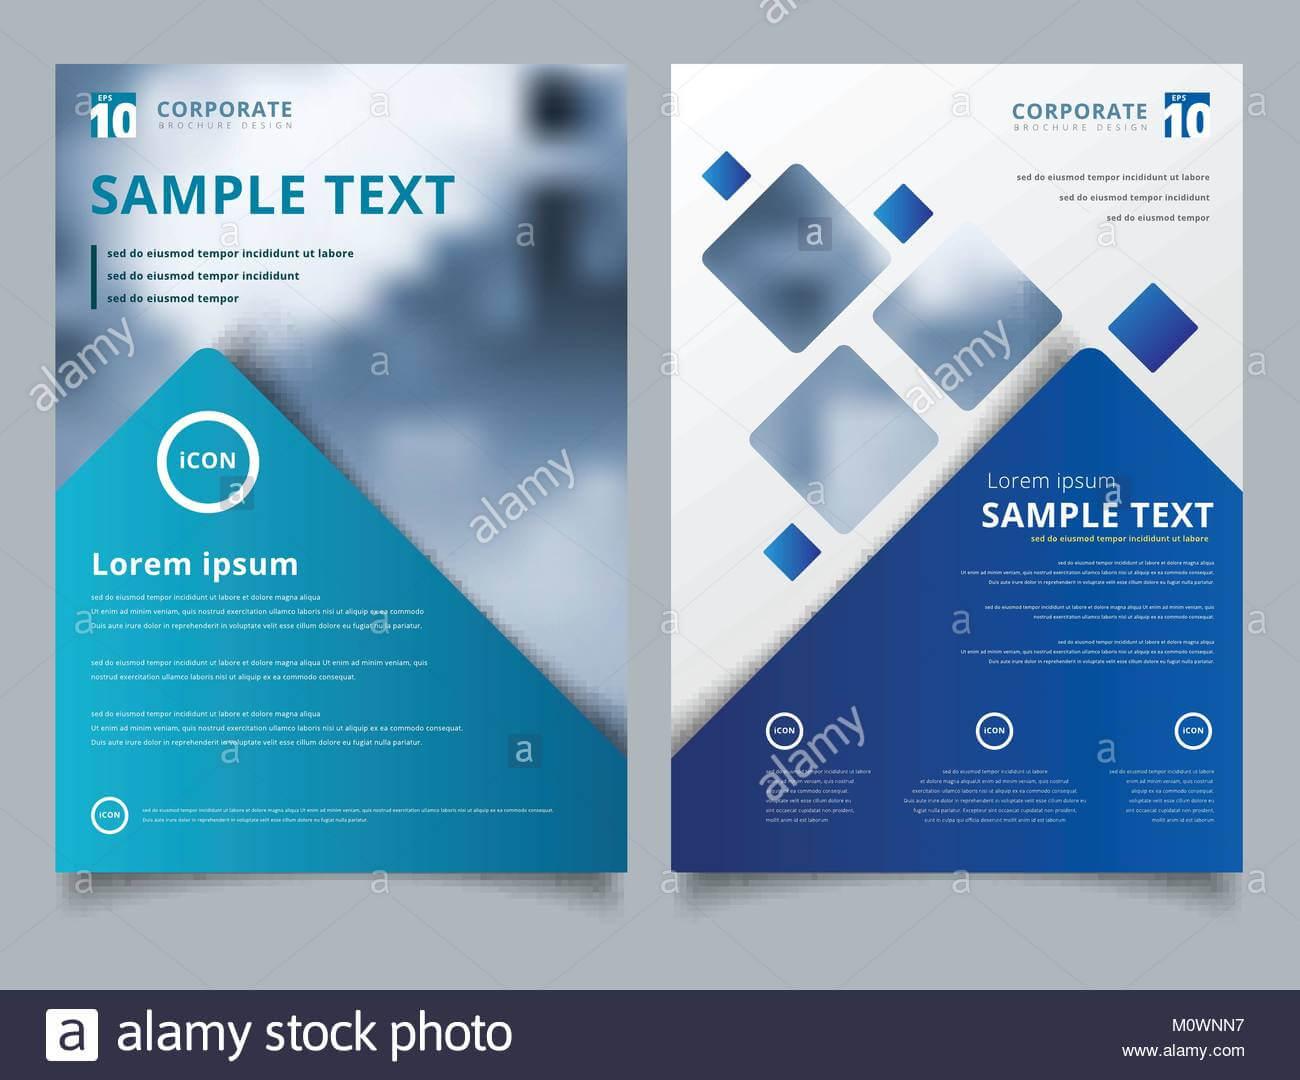 Free Poster Design Templates Illustrator With Scientific regarding Illustrator Brochure Templates Free Download